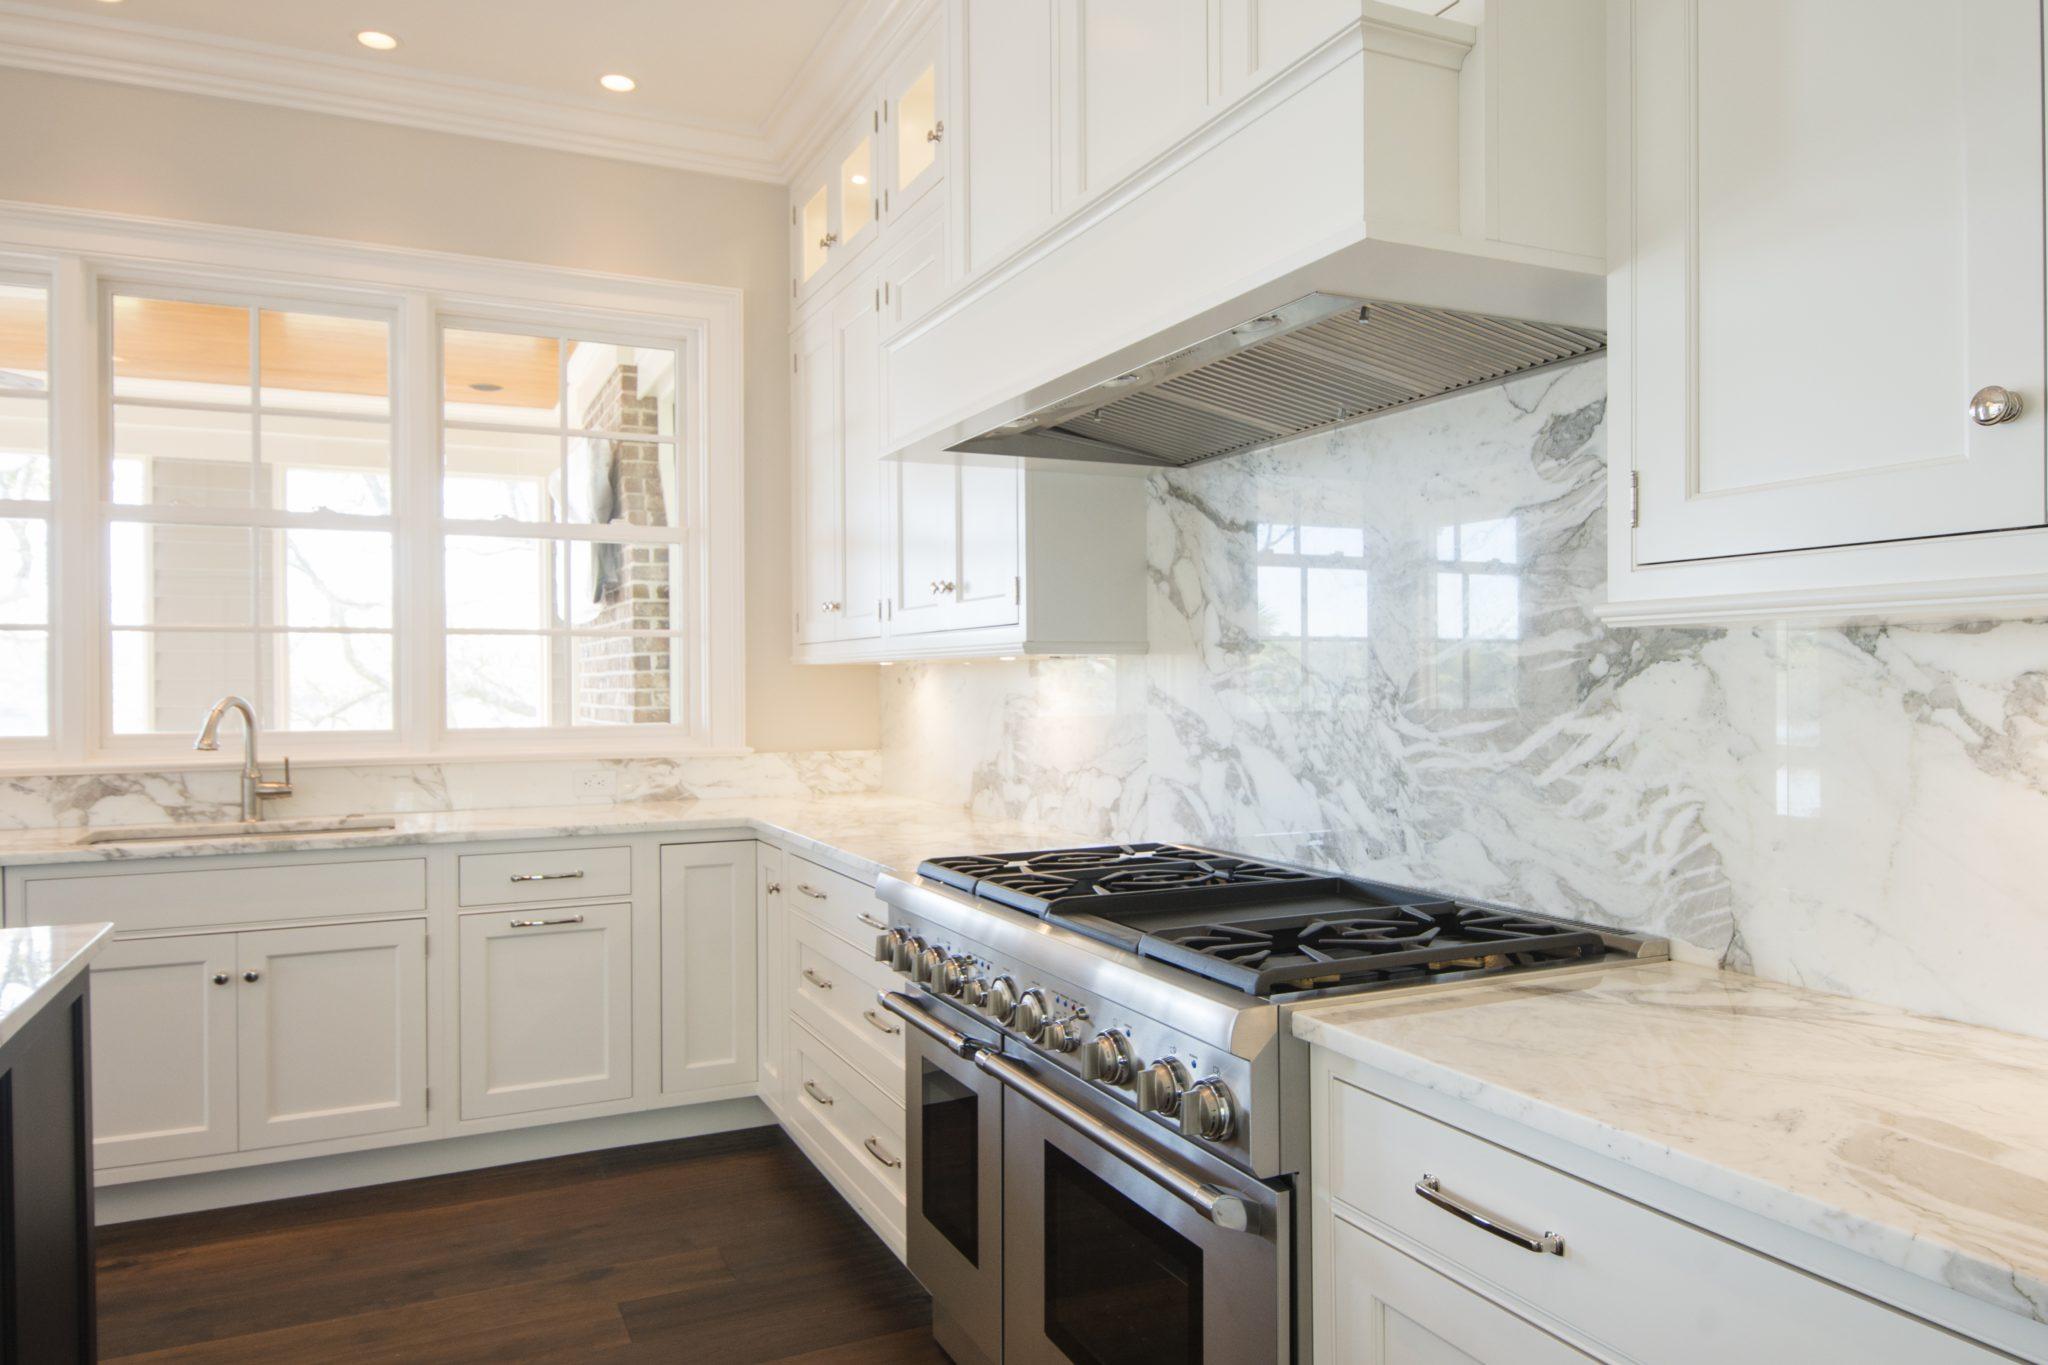 38 Kitchens With Marble Backsplashes Chairish Blog